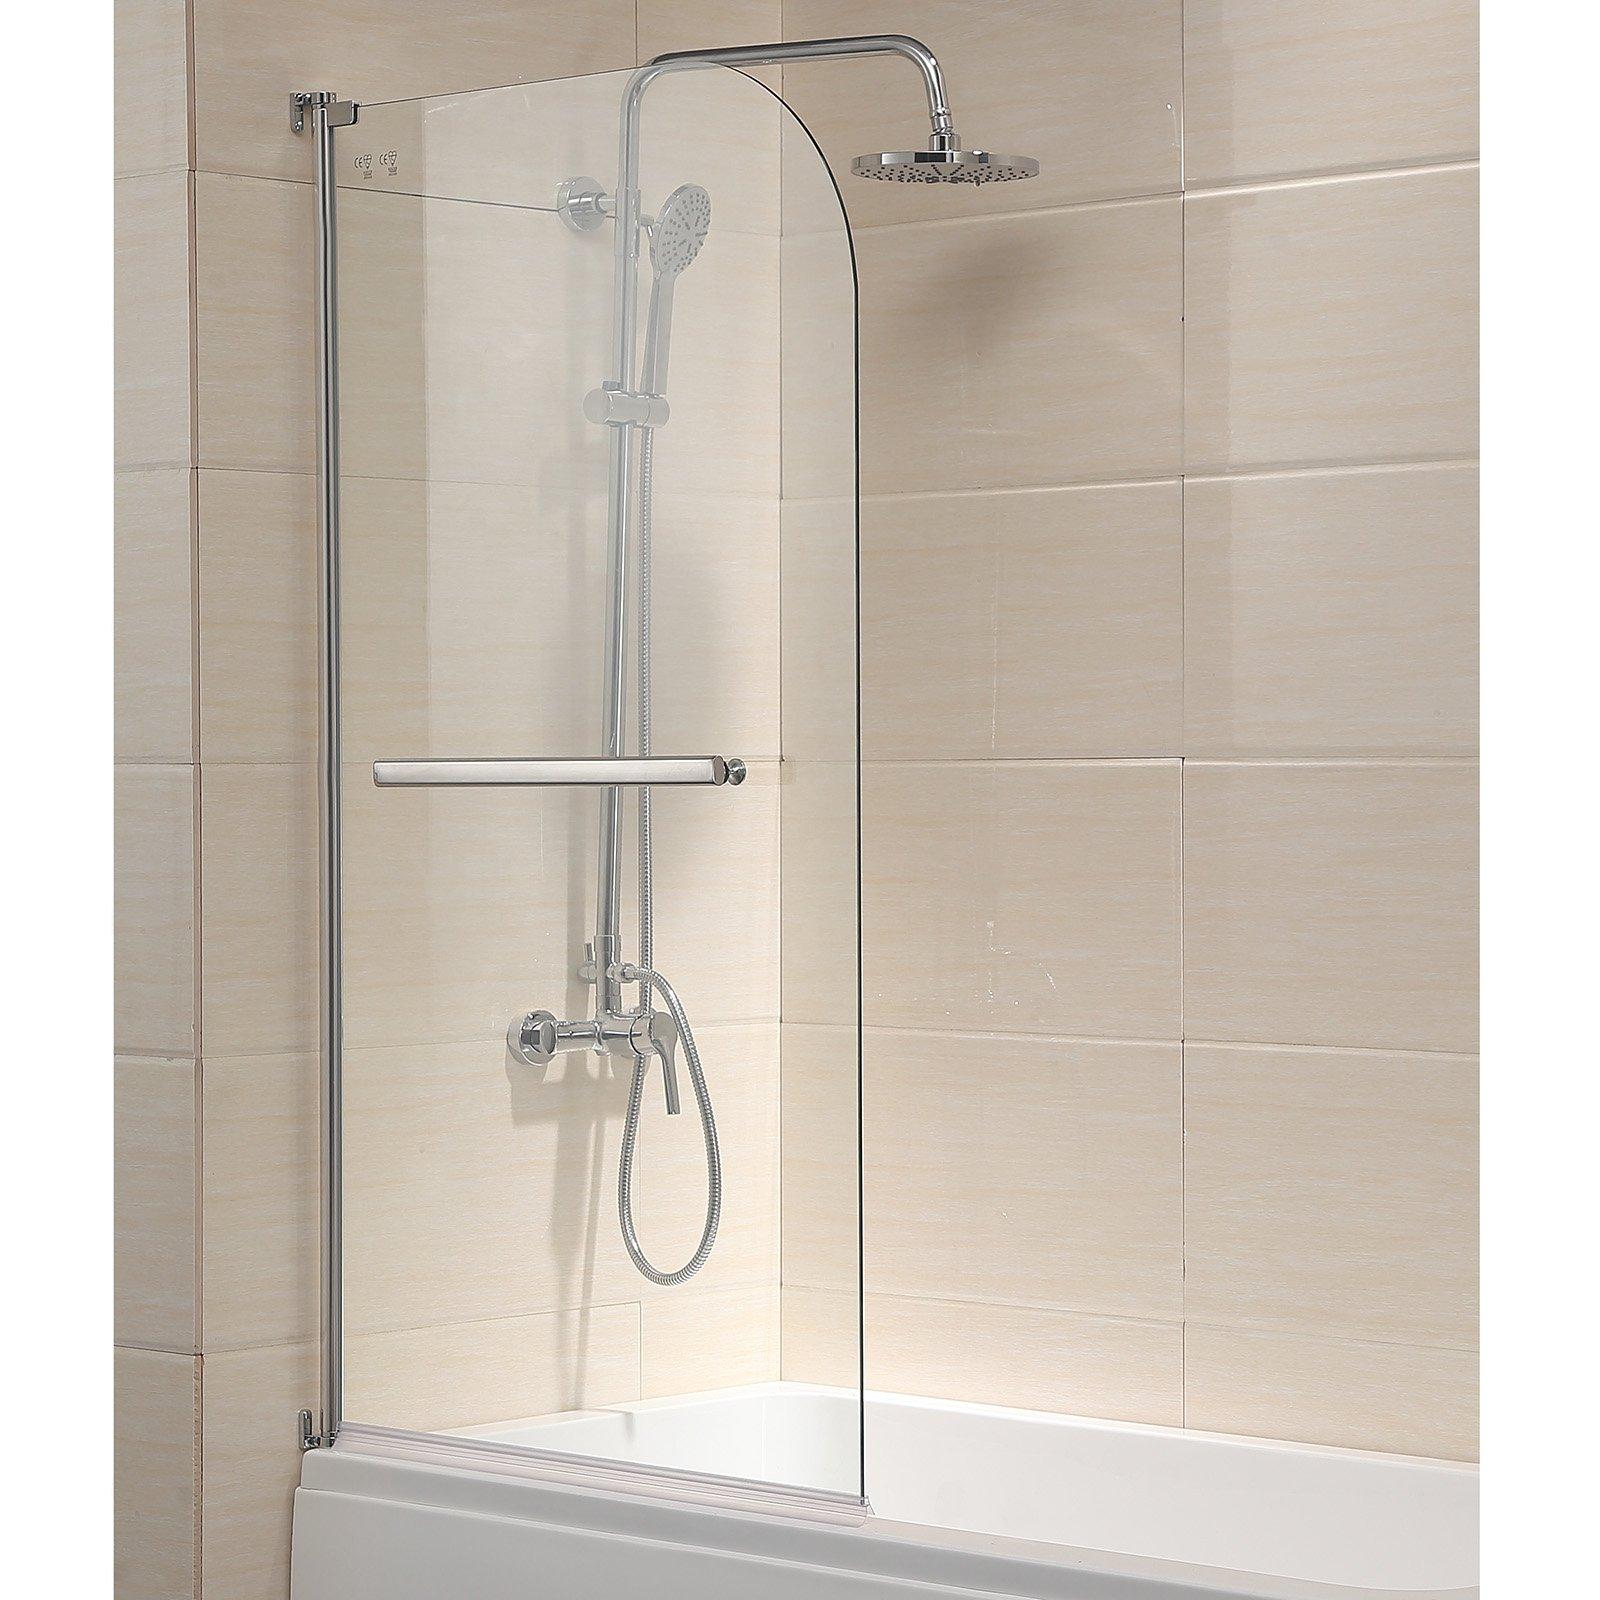 Mecor Shower Door, 55''X31'' Glass Enclosure Hinged Bathtub Door Frameless 1/4'' Clear Glass Over 180° Pivot Radius Chrome Finish